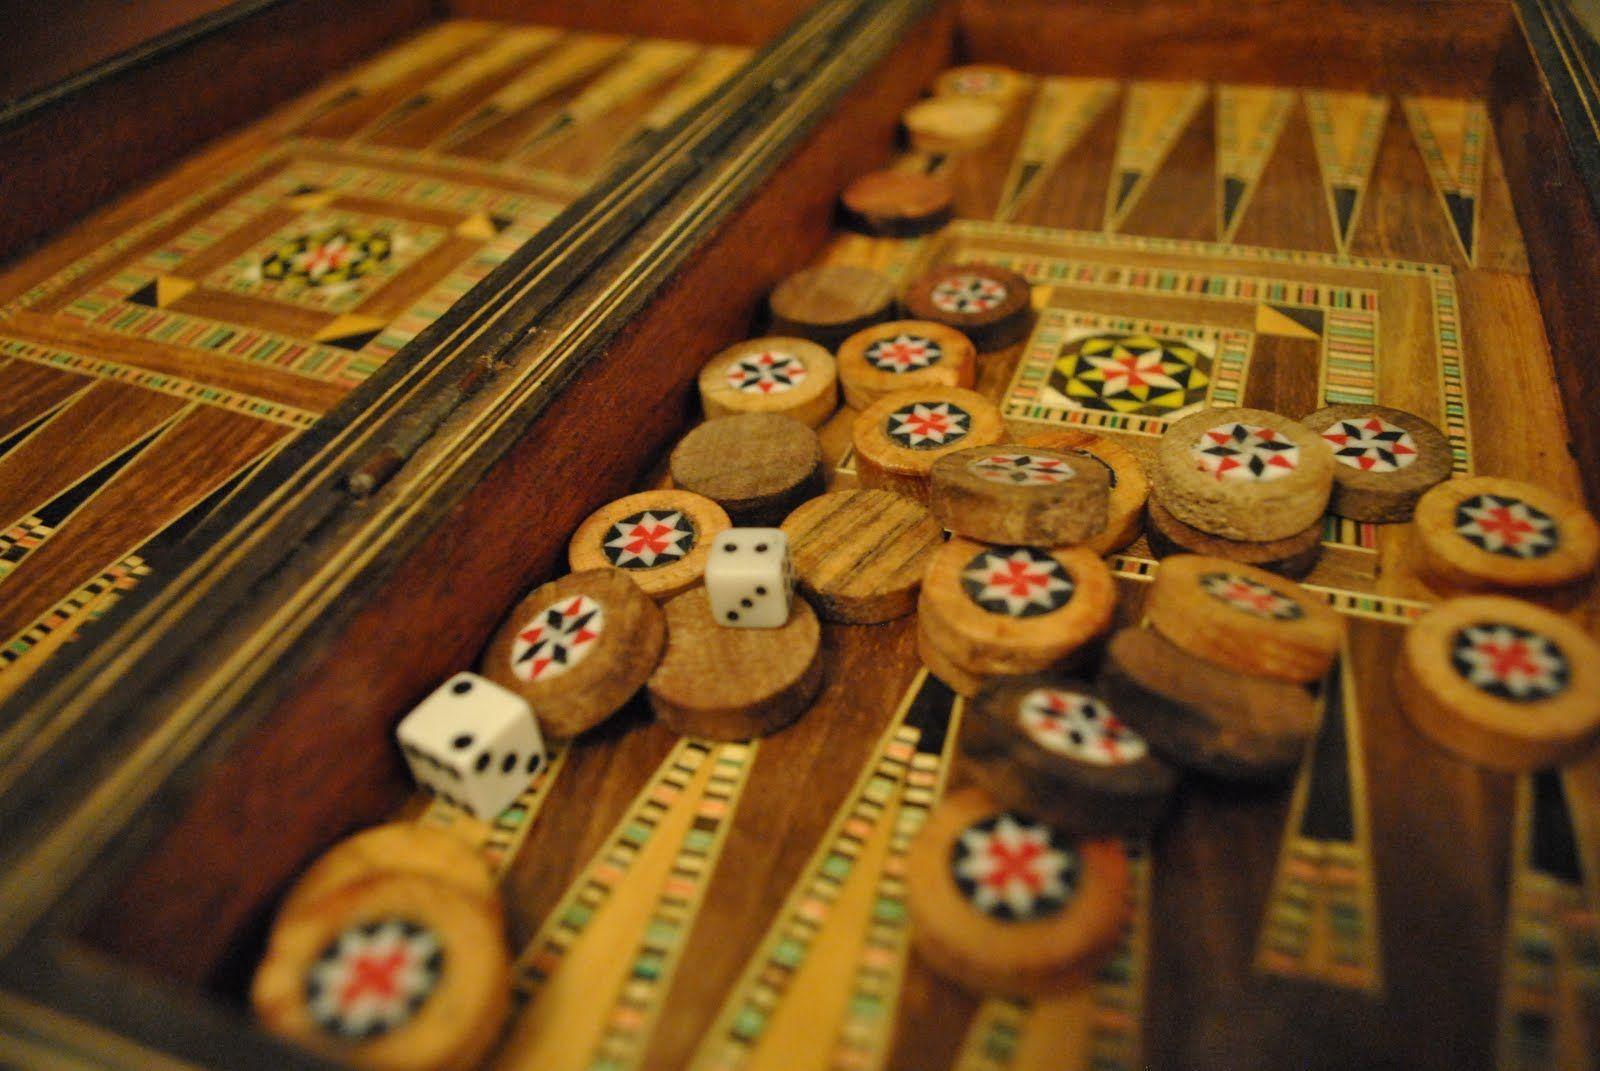 Play slots for fun no money